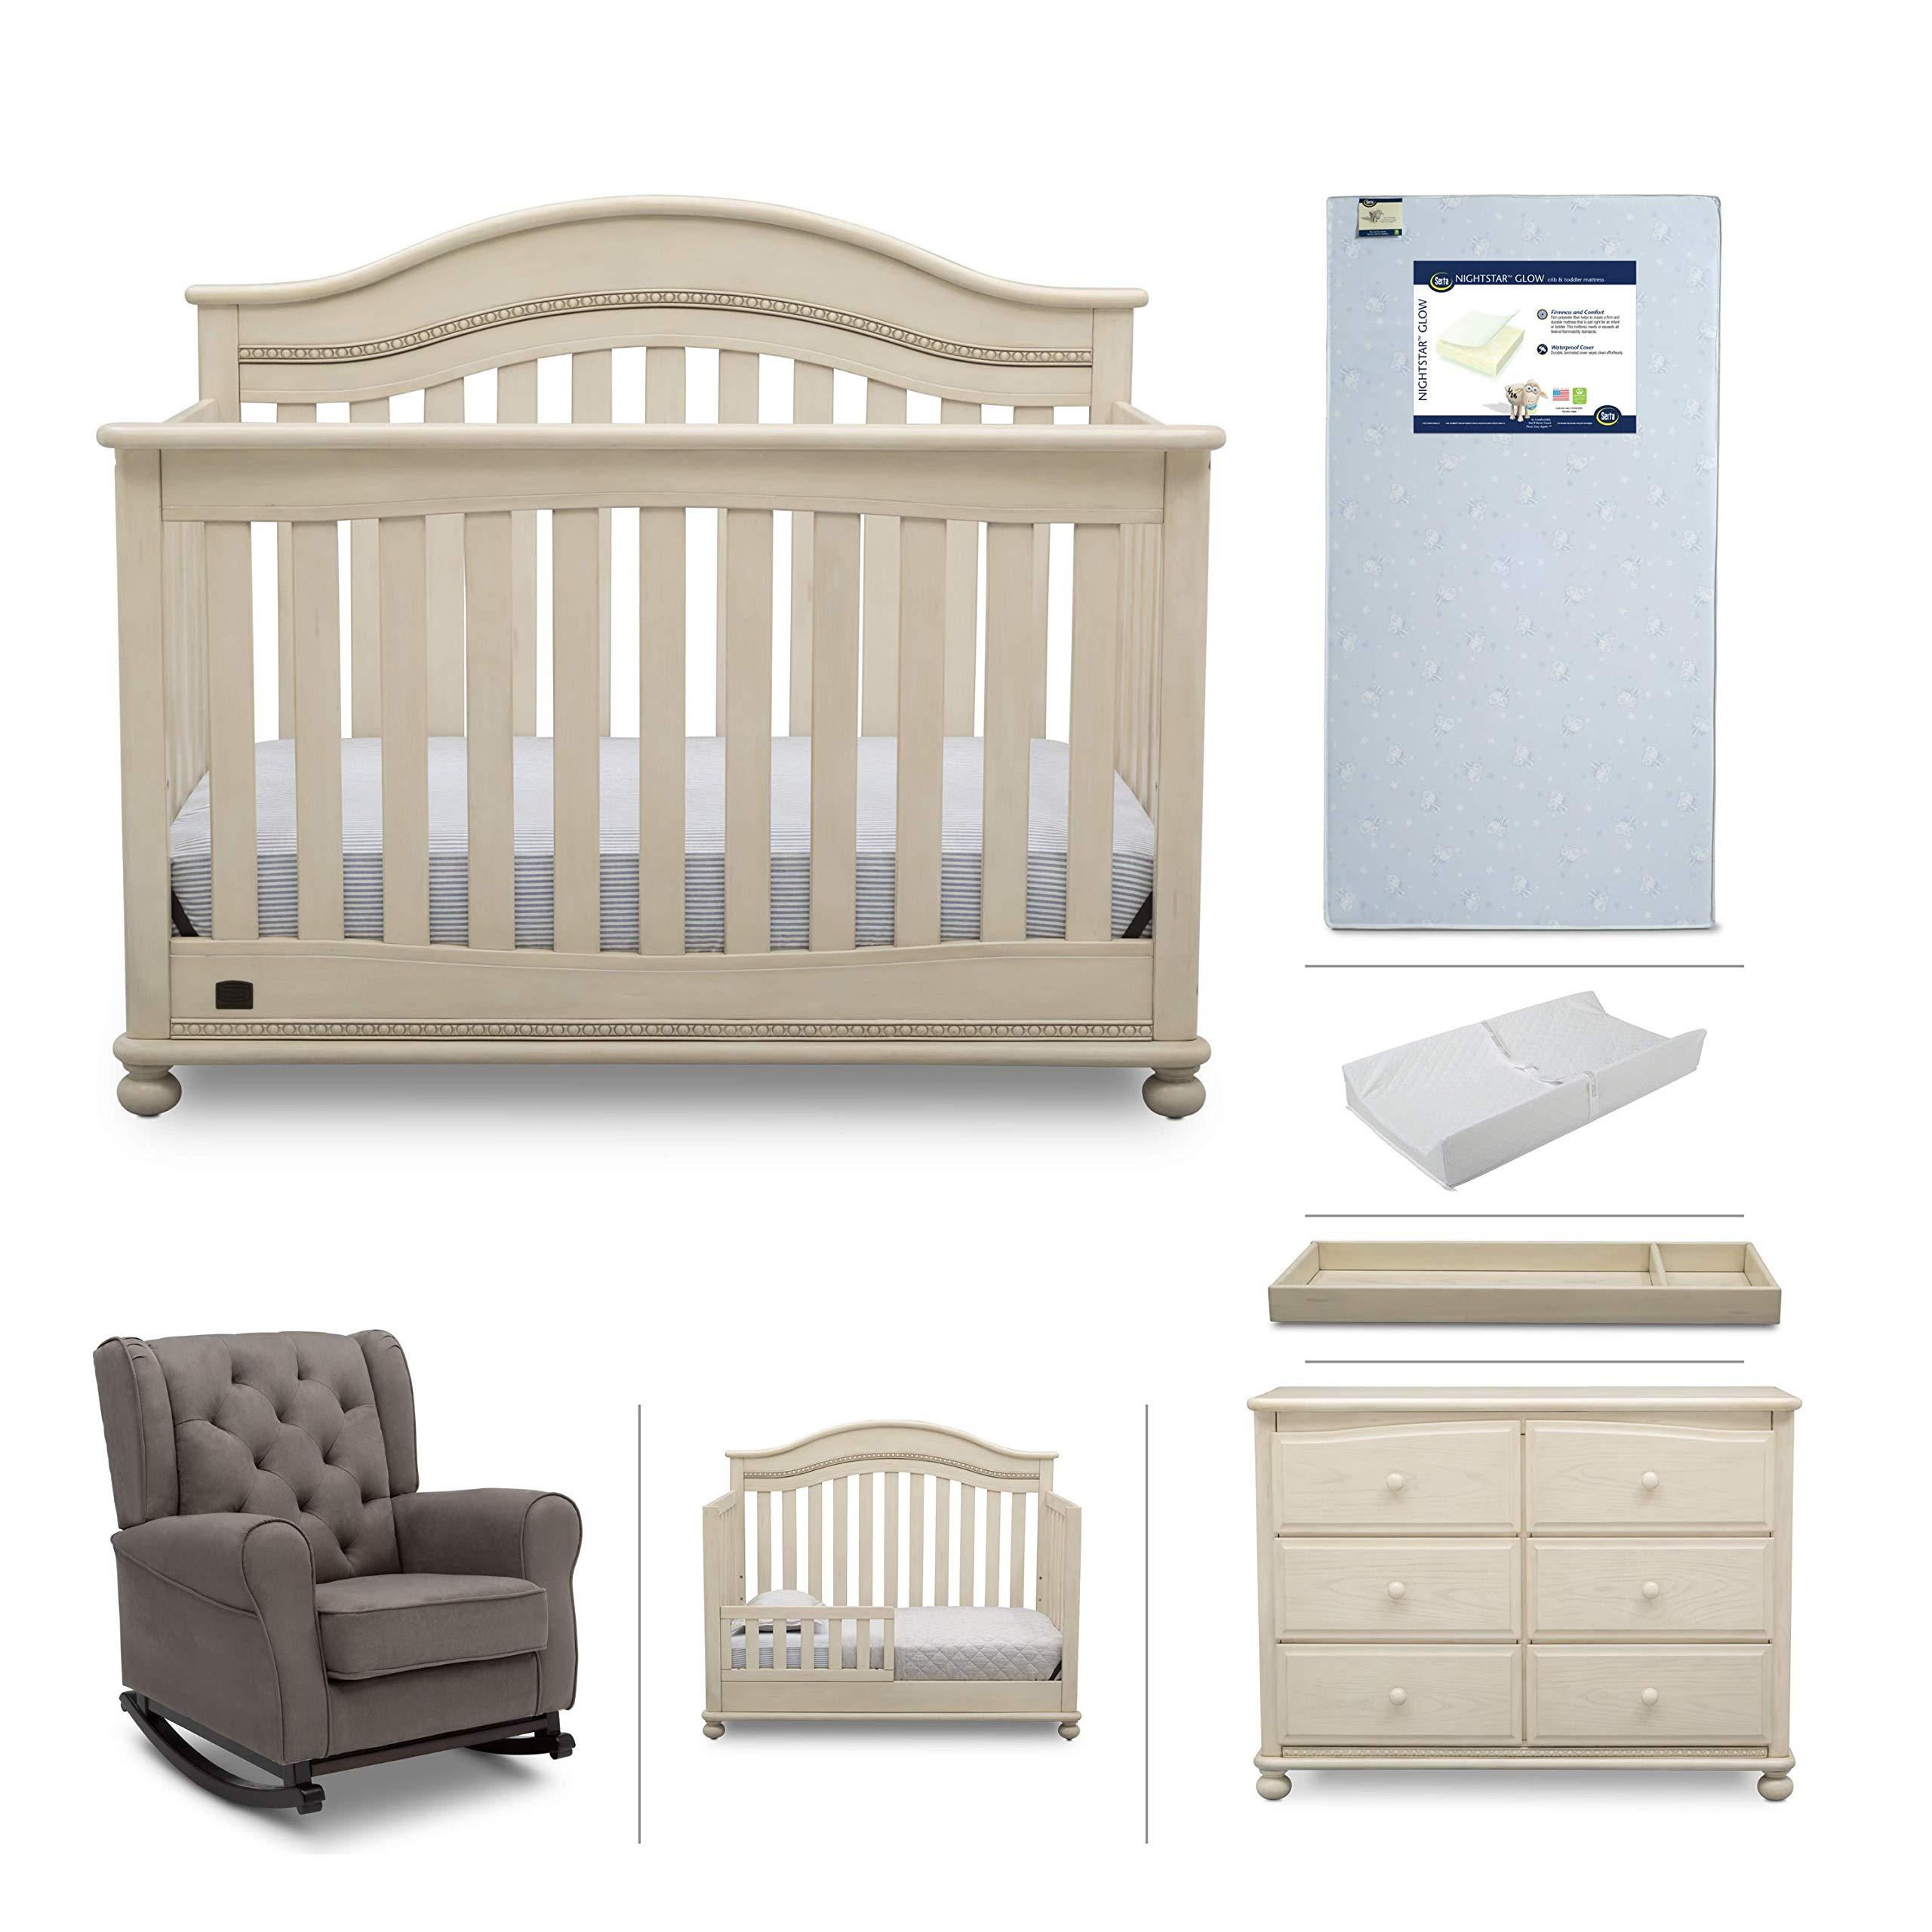 Baby Nursery Furniture Set - 7 Pieces Including Convertible Crib, Dresser, Rocking Chair, Crib Mattress, Toddler Rail, Changing Top, Changing Pad - Simmons Kids Bristol Antique White/Graphite by Delta Children